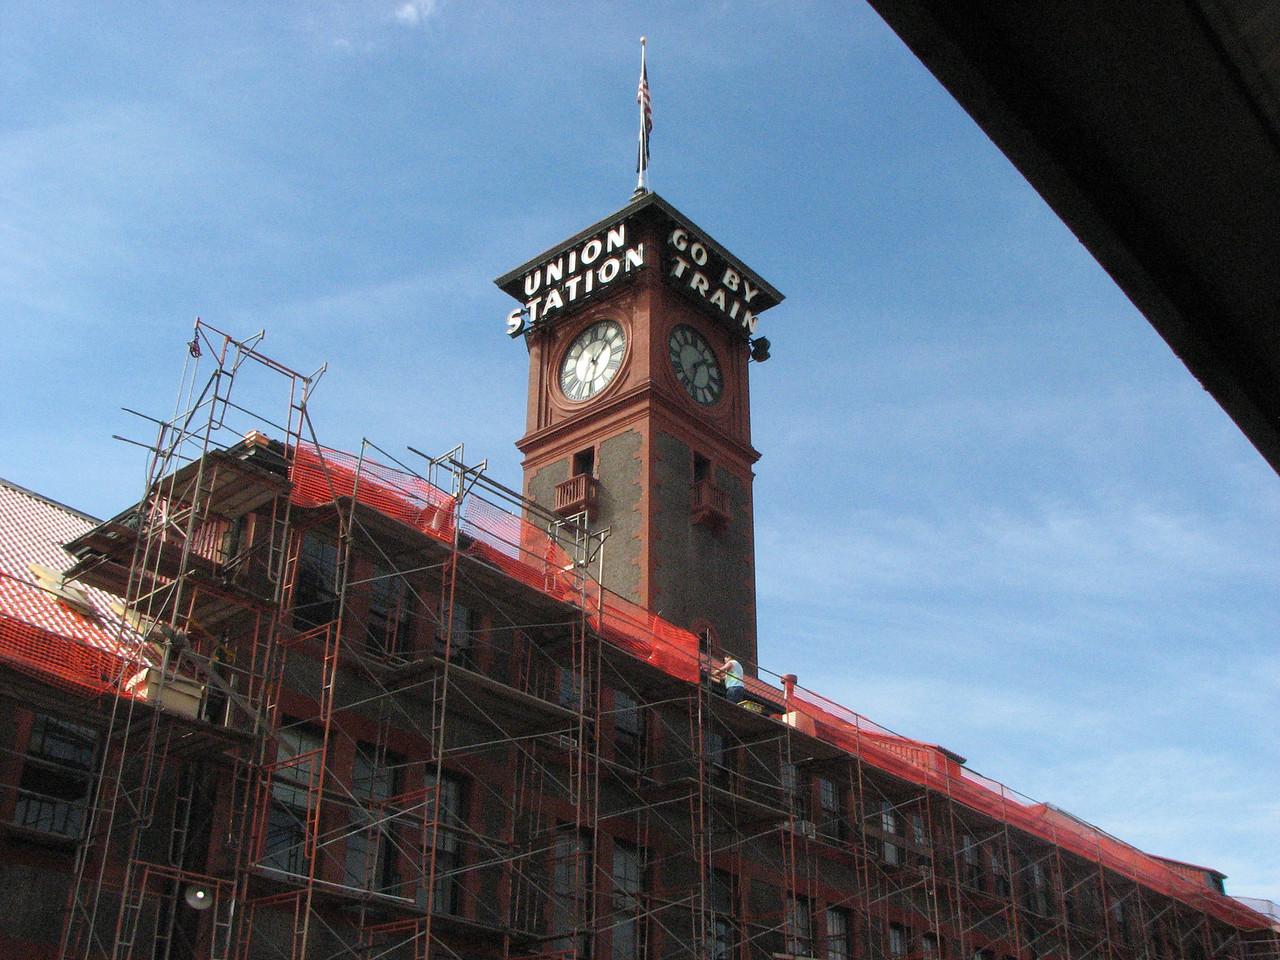 The Portland Station being refurbished.